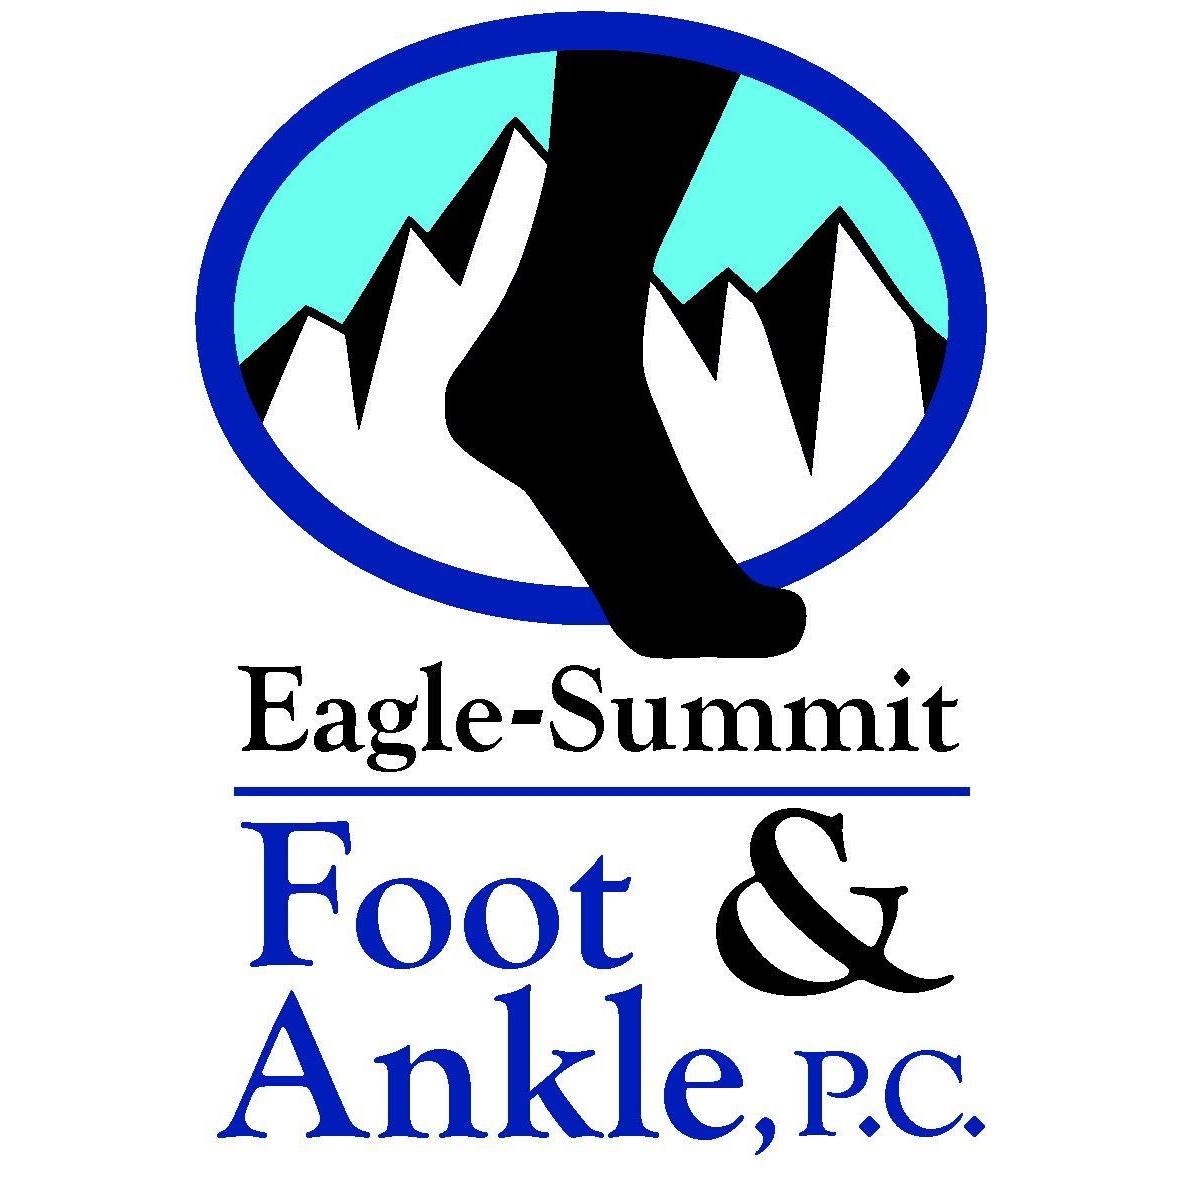 Podiatrist in CO Frisco 80443 Eagle-Summit Foot & Ankle 842 Summit Blvd. Unit 15 (970)668-4565